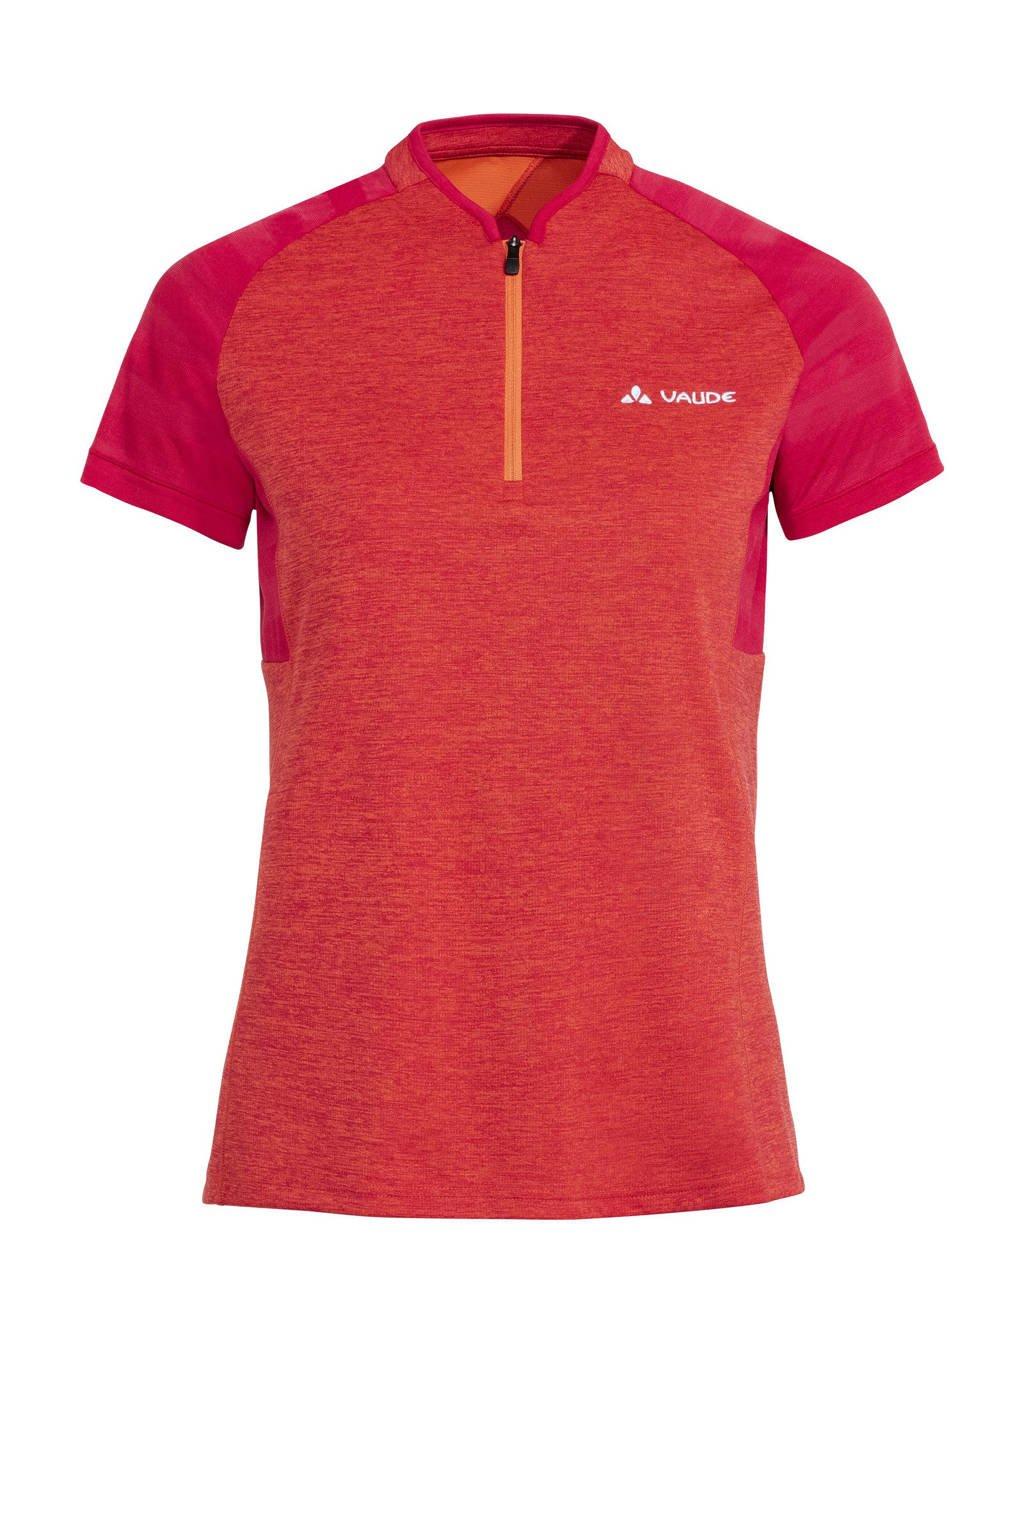 VAUDE   fiets T-shirt Tamaro III oranje/roze, Oranje/roze